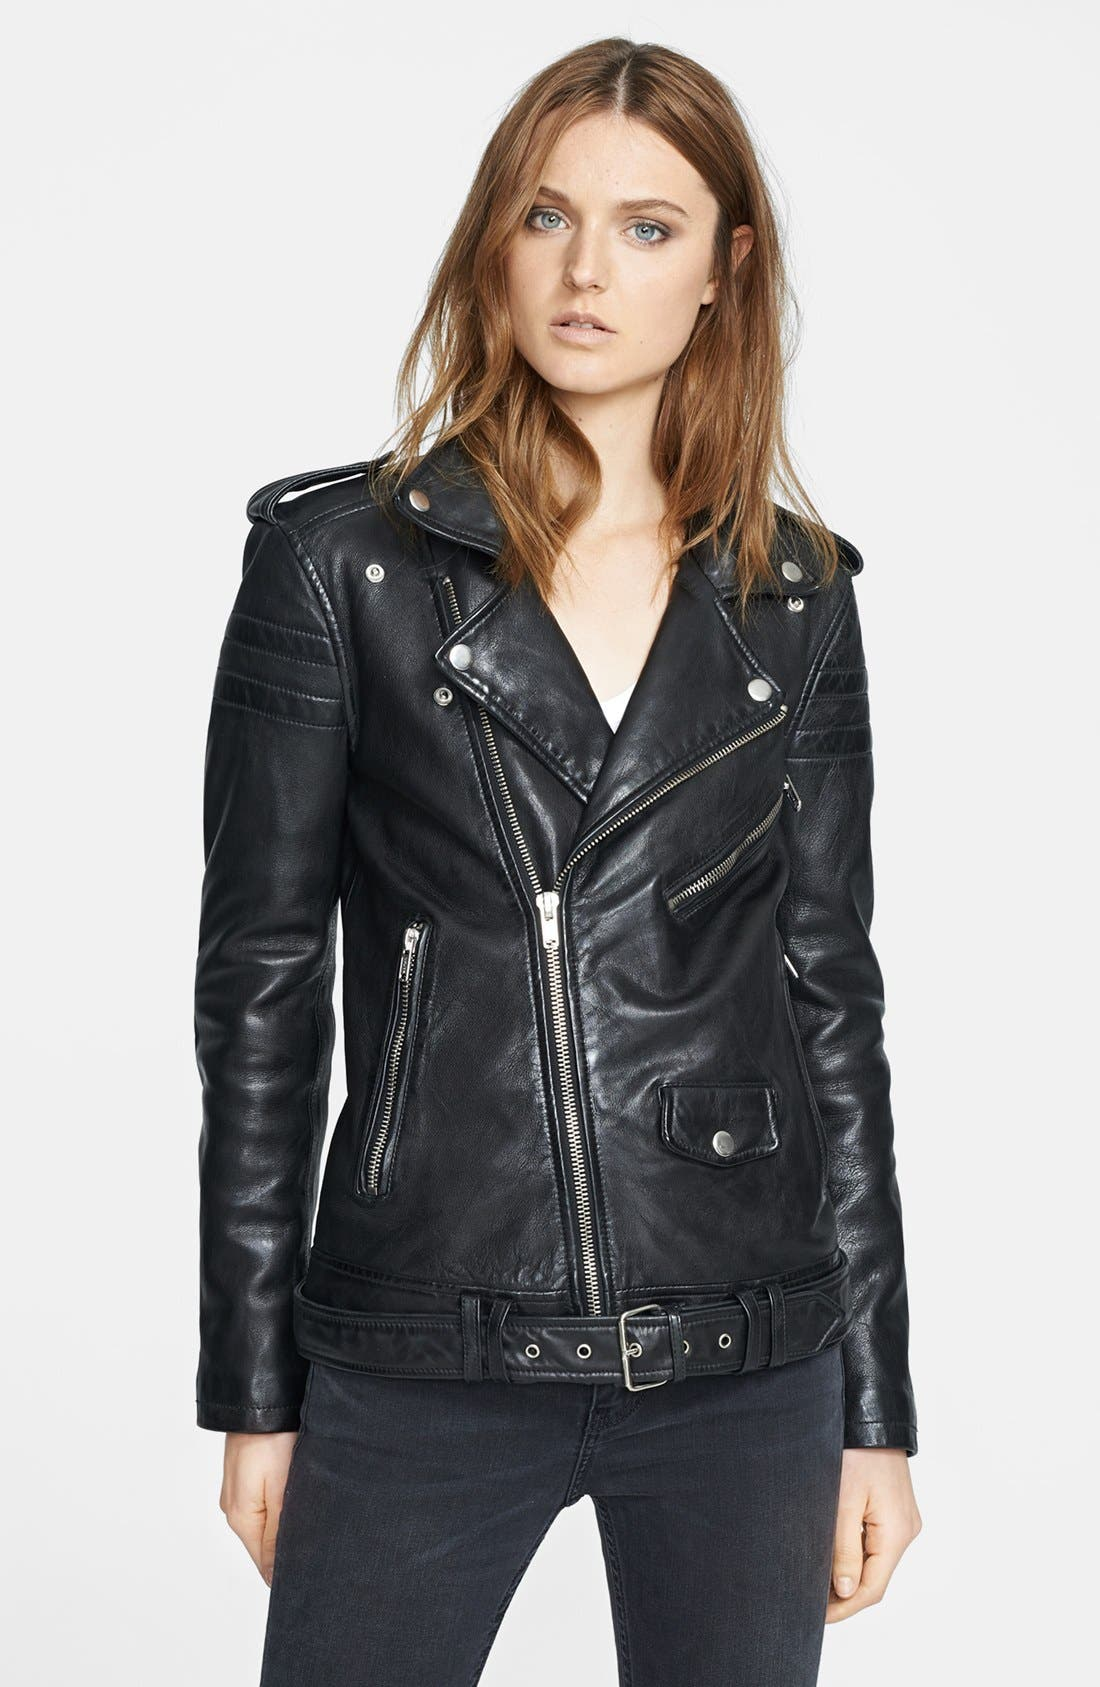 Alternate Image 1 Selected - BLK DNM Lambskin Leather Biker Jacket